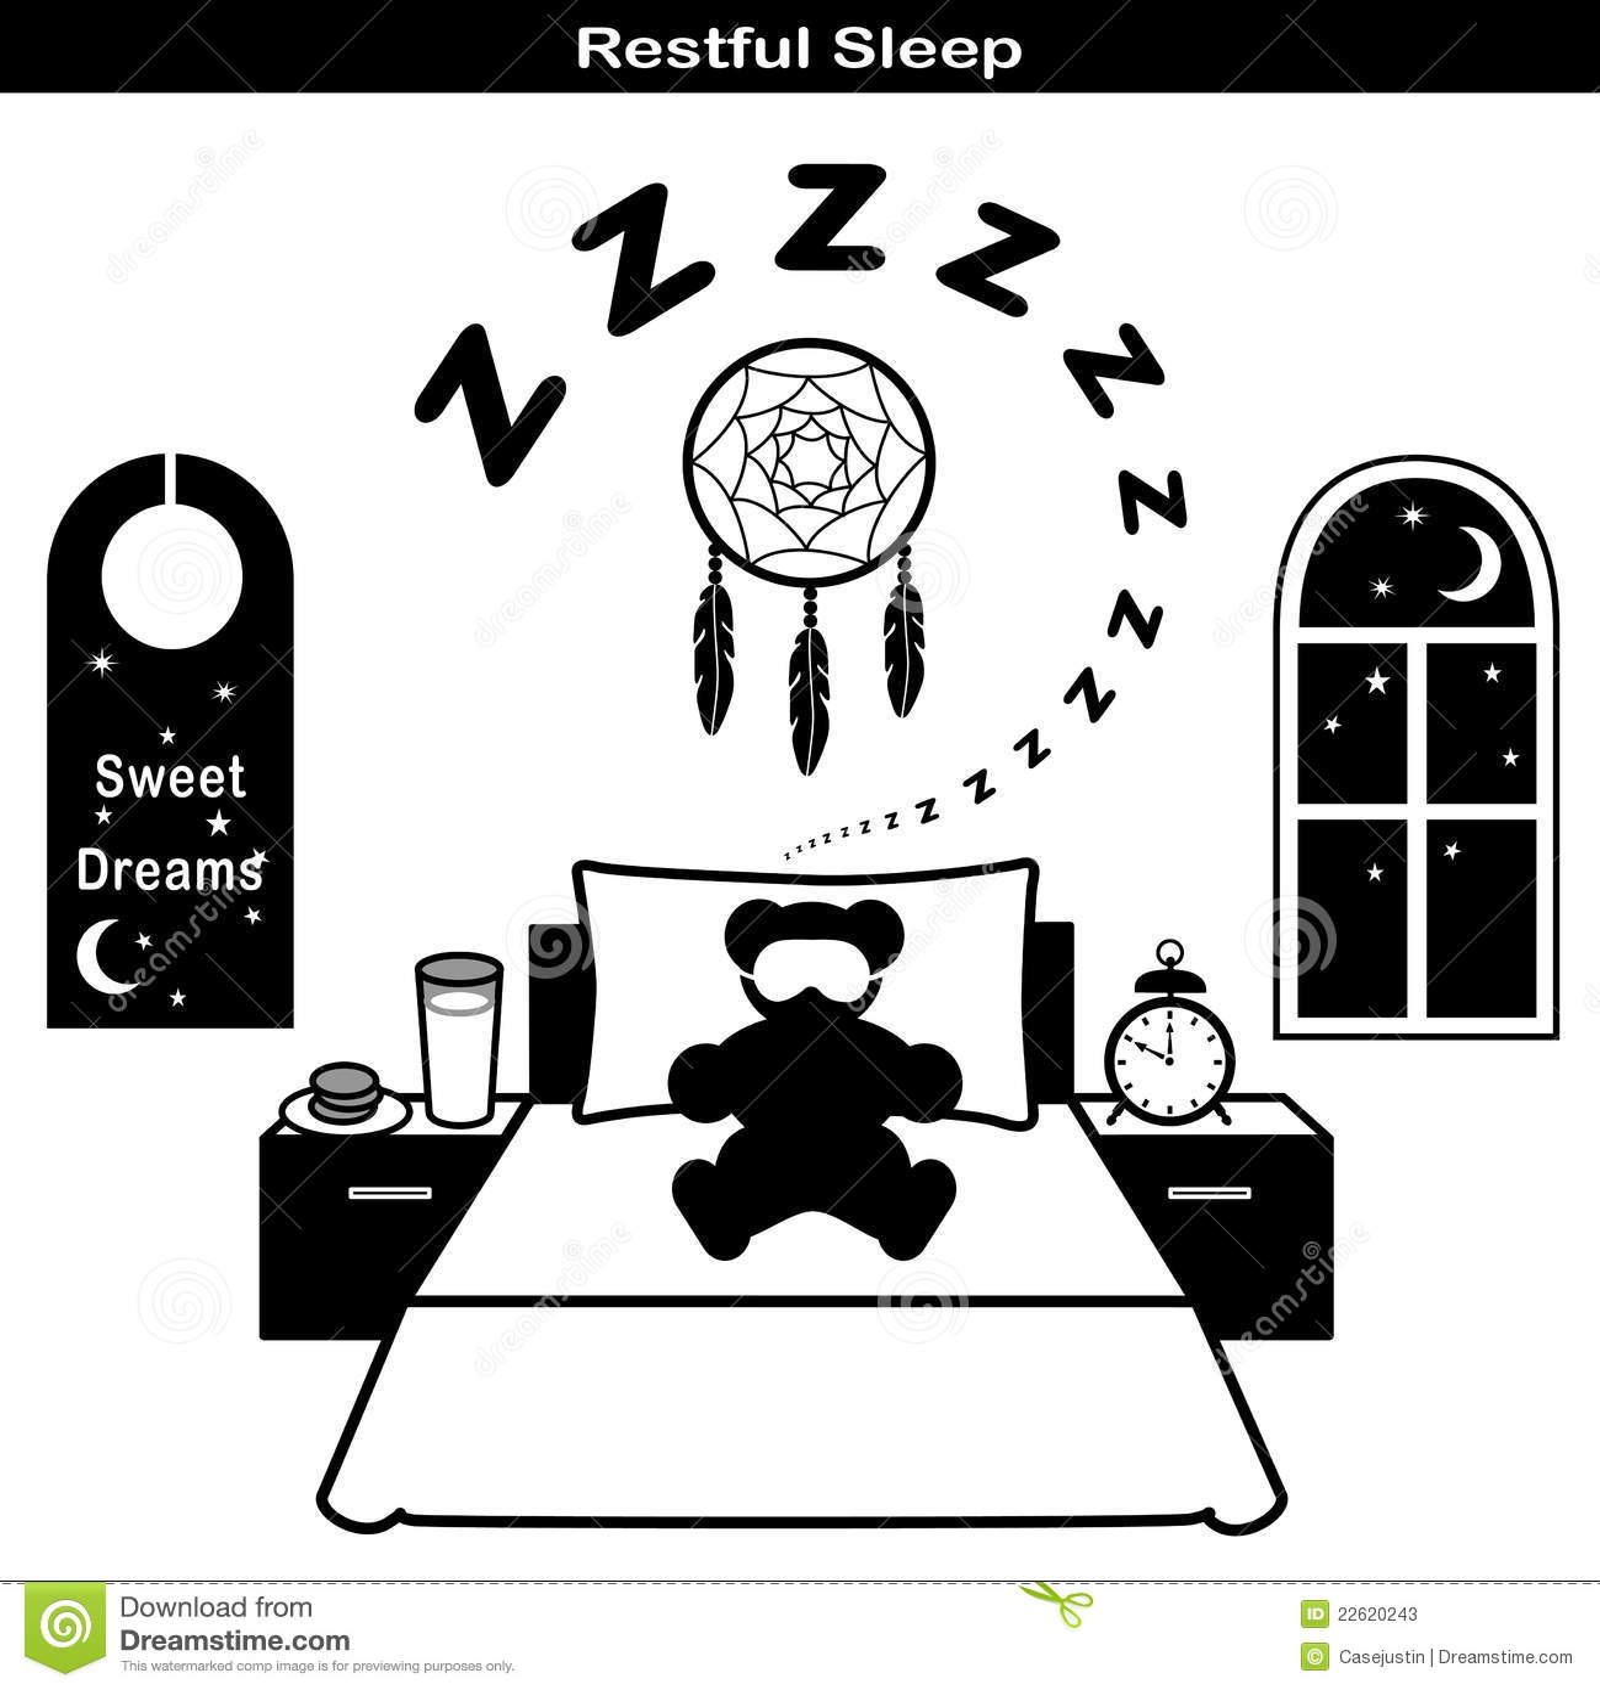 Restful Sleep Icons Stock Photos